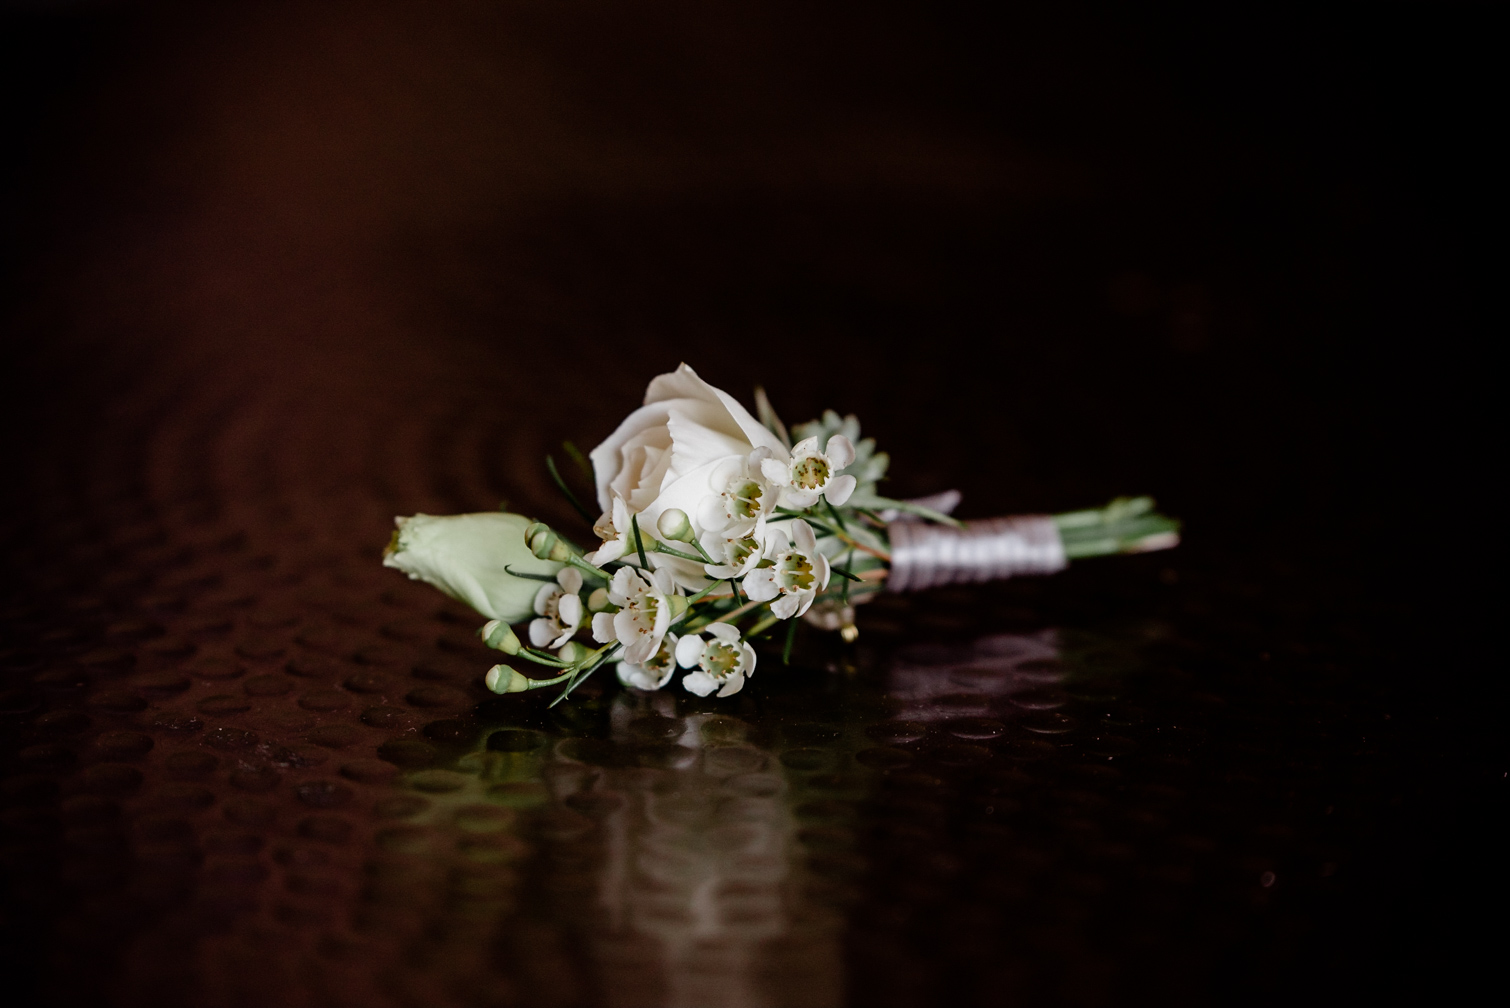 The_Belongil_Byron_Bay_Weddings_New_Black_Studios-28.jpg